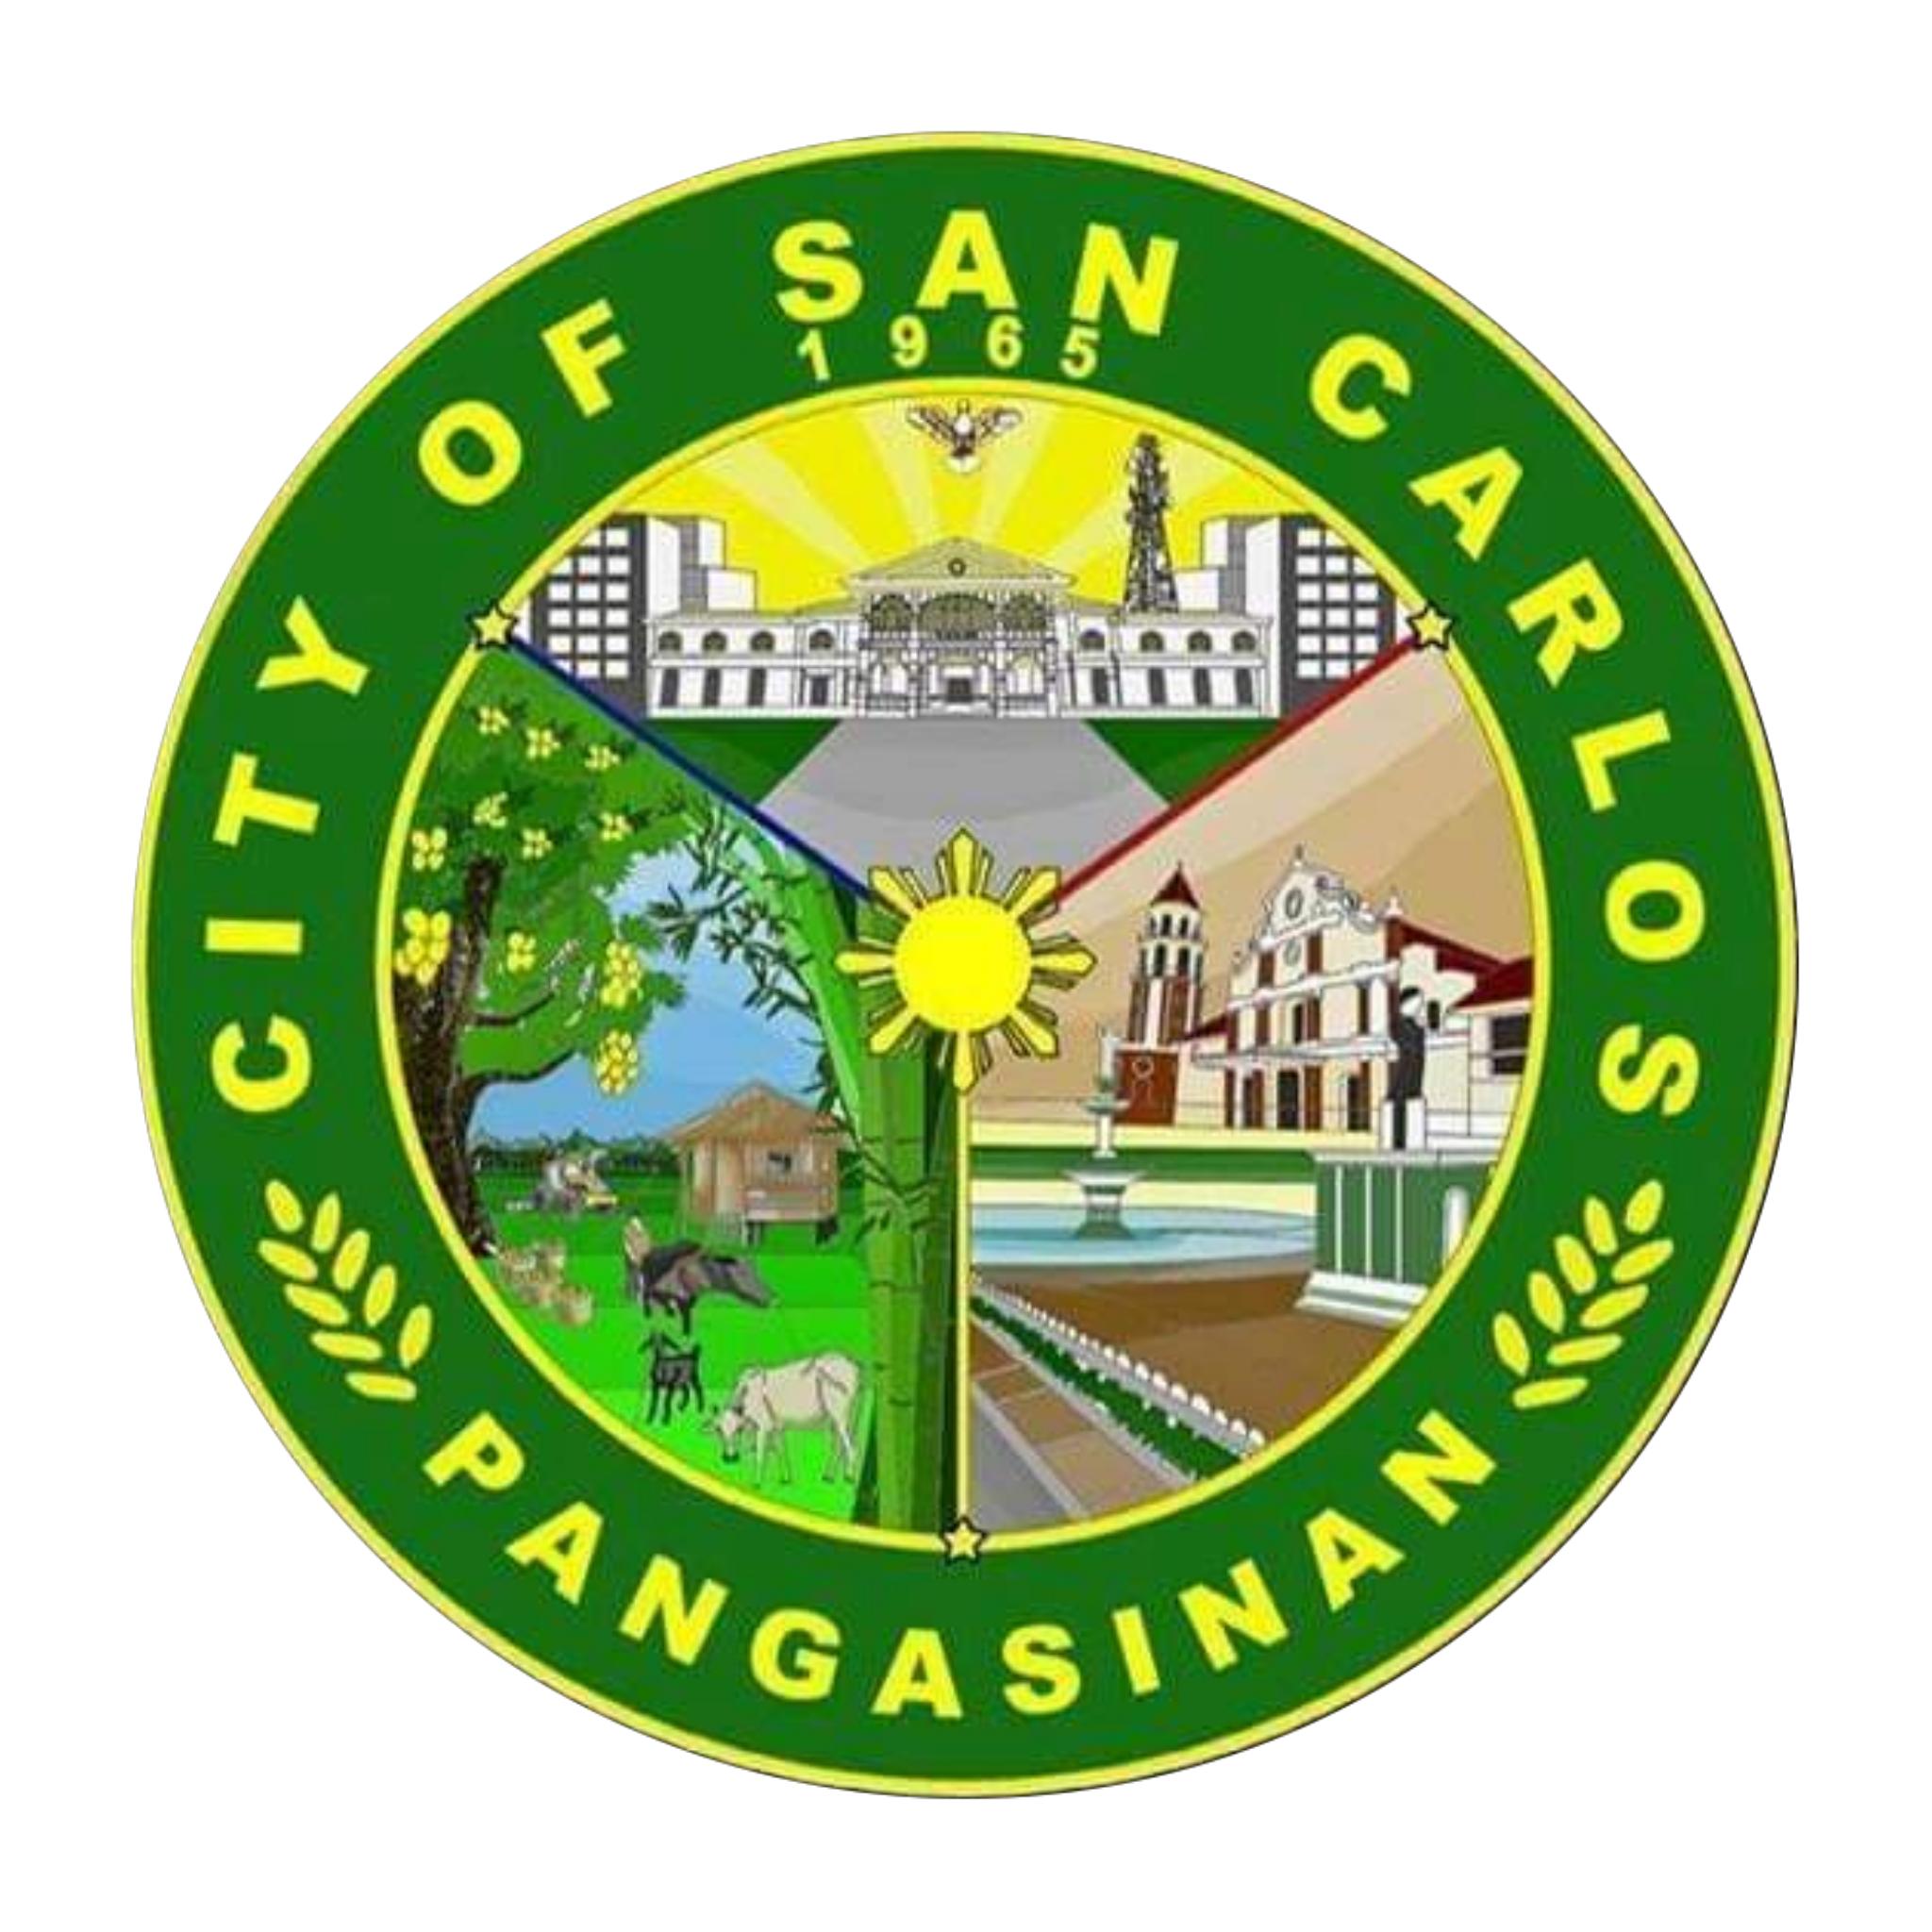 San carlos city